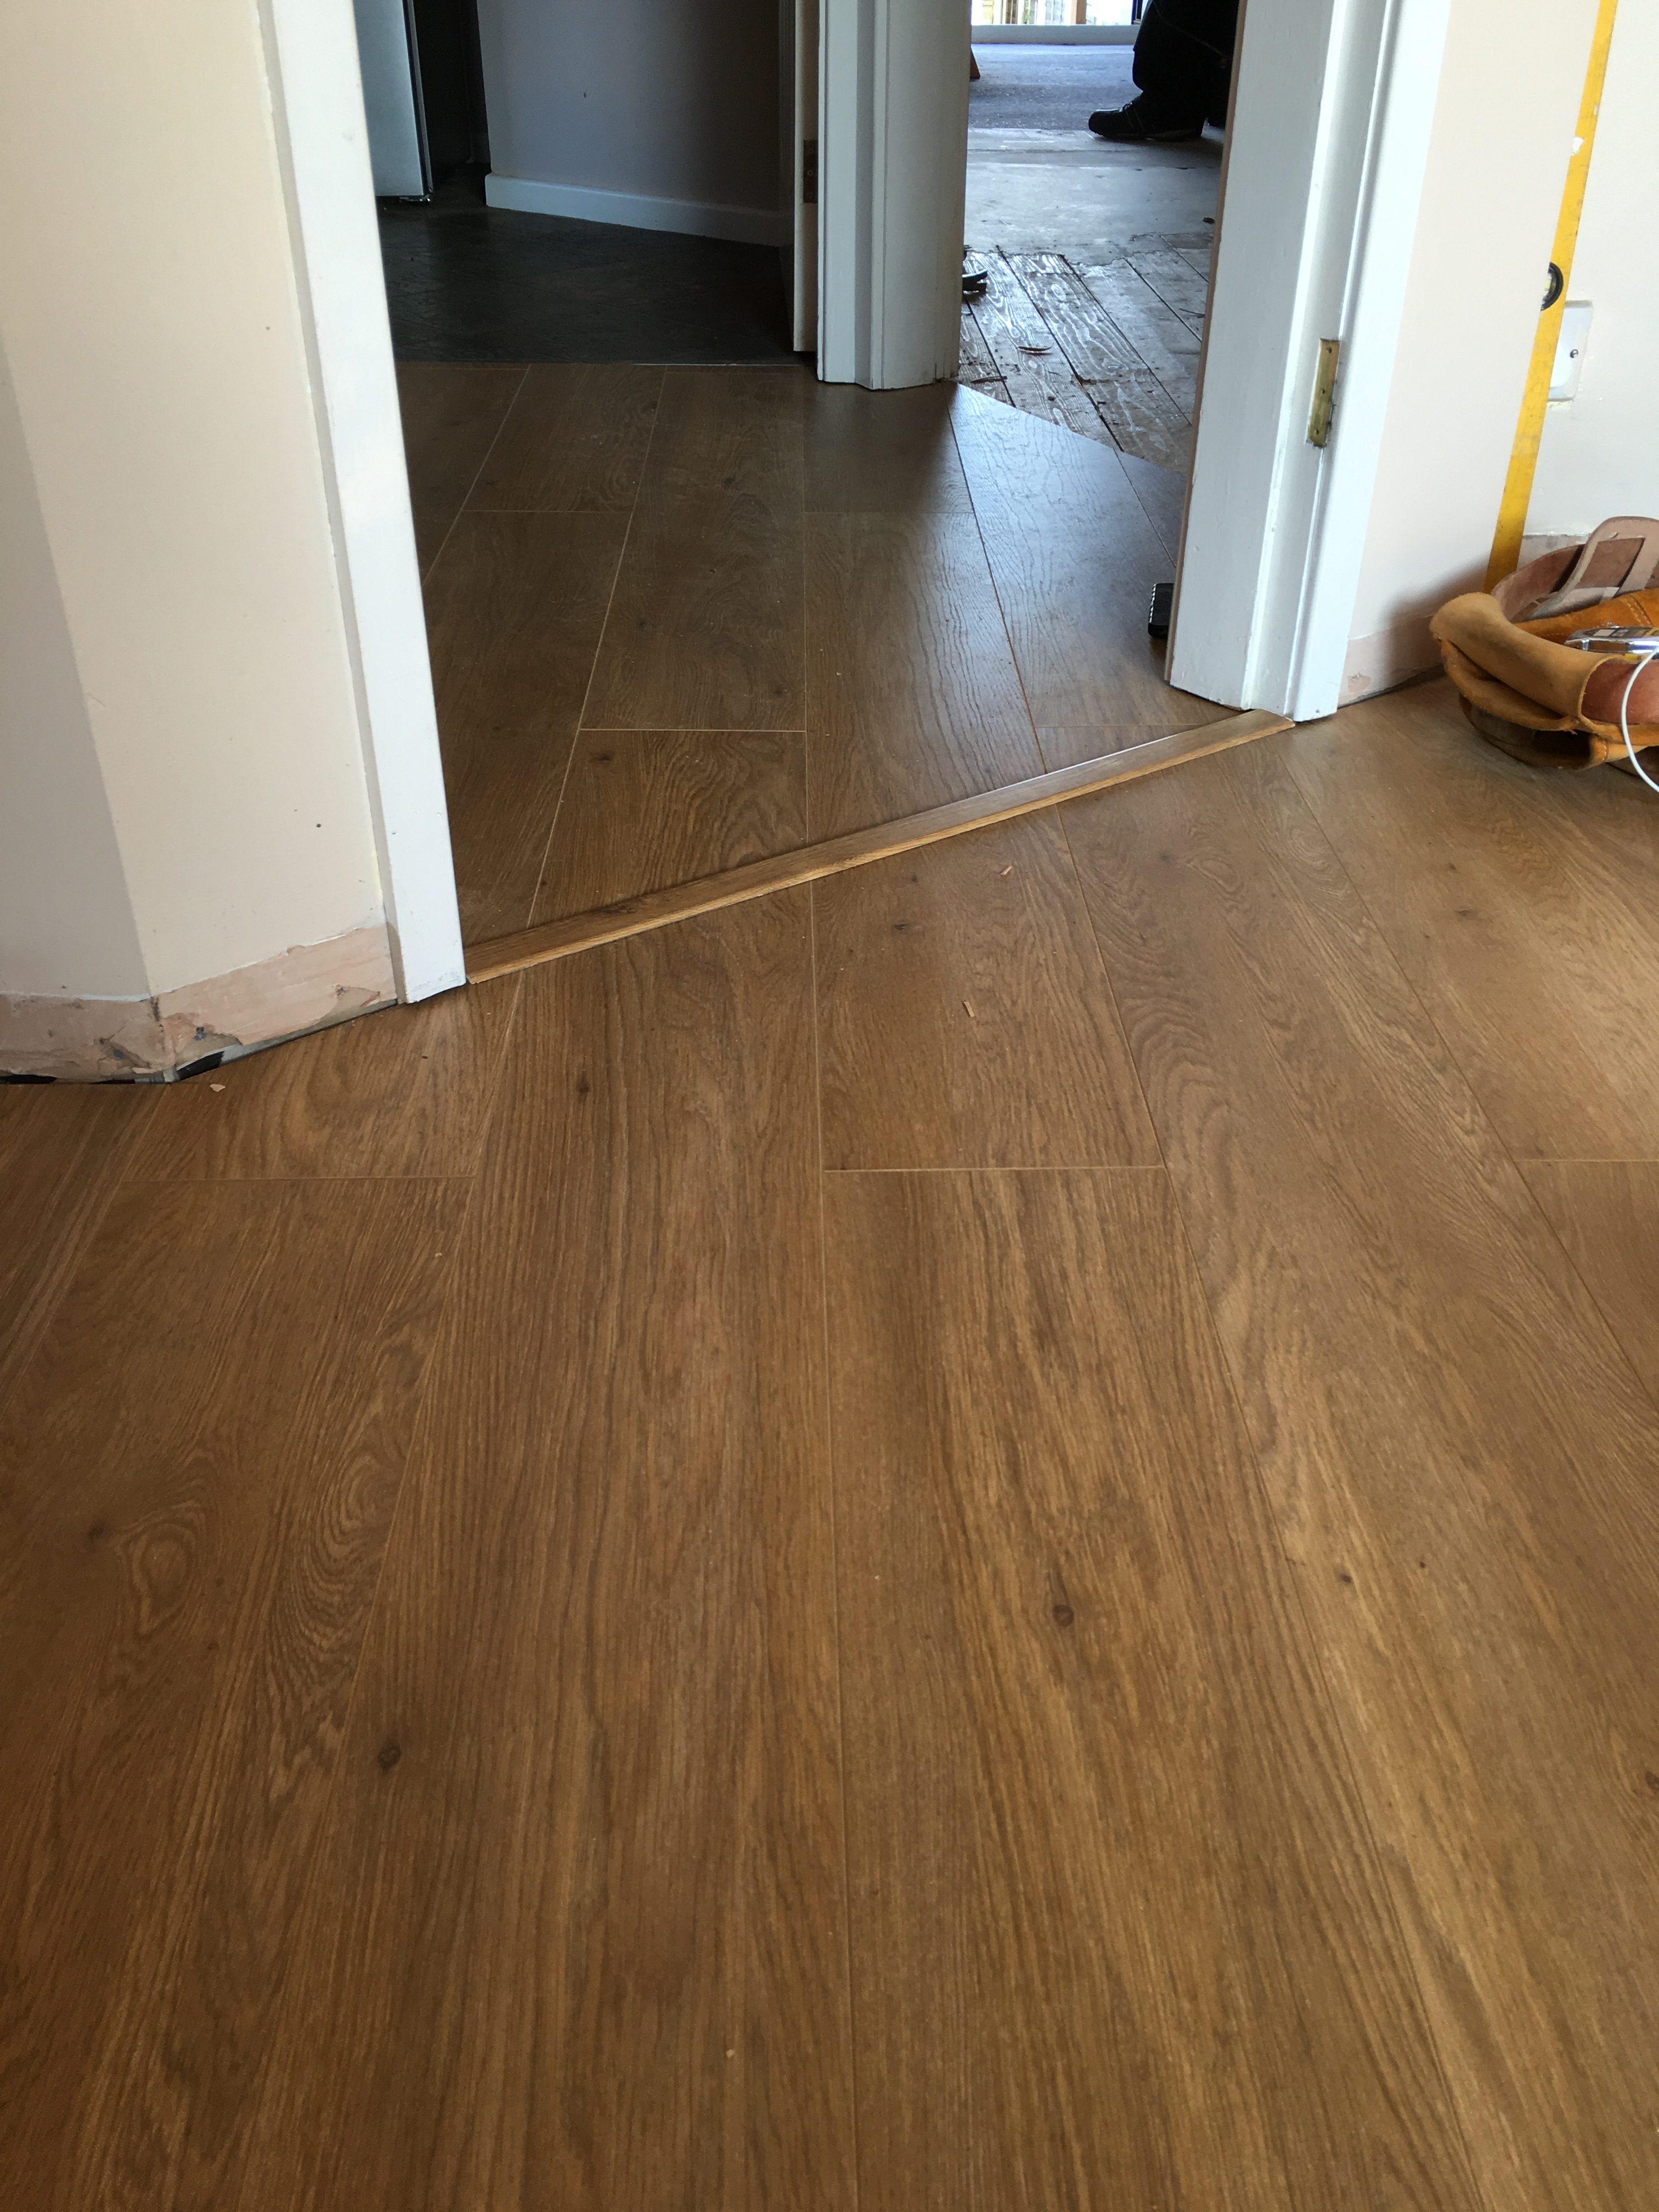 Flooring job sale s wilson joinery for Flooring jobs